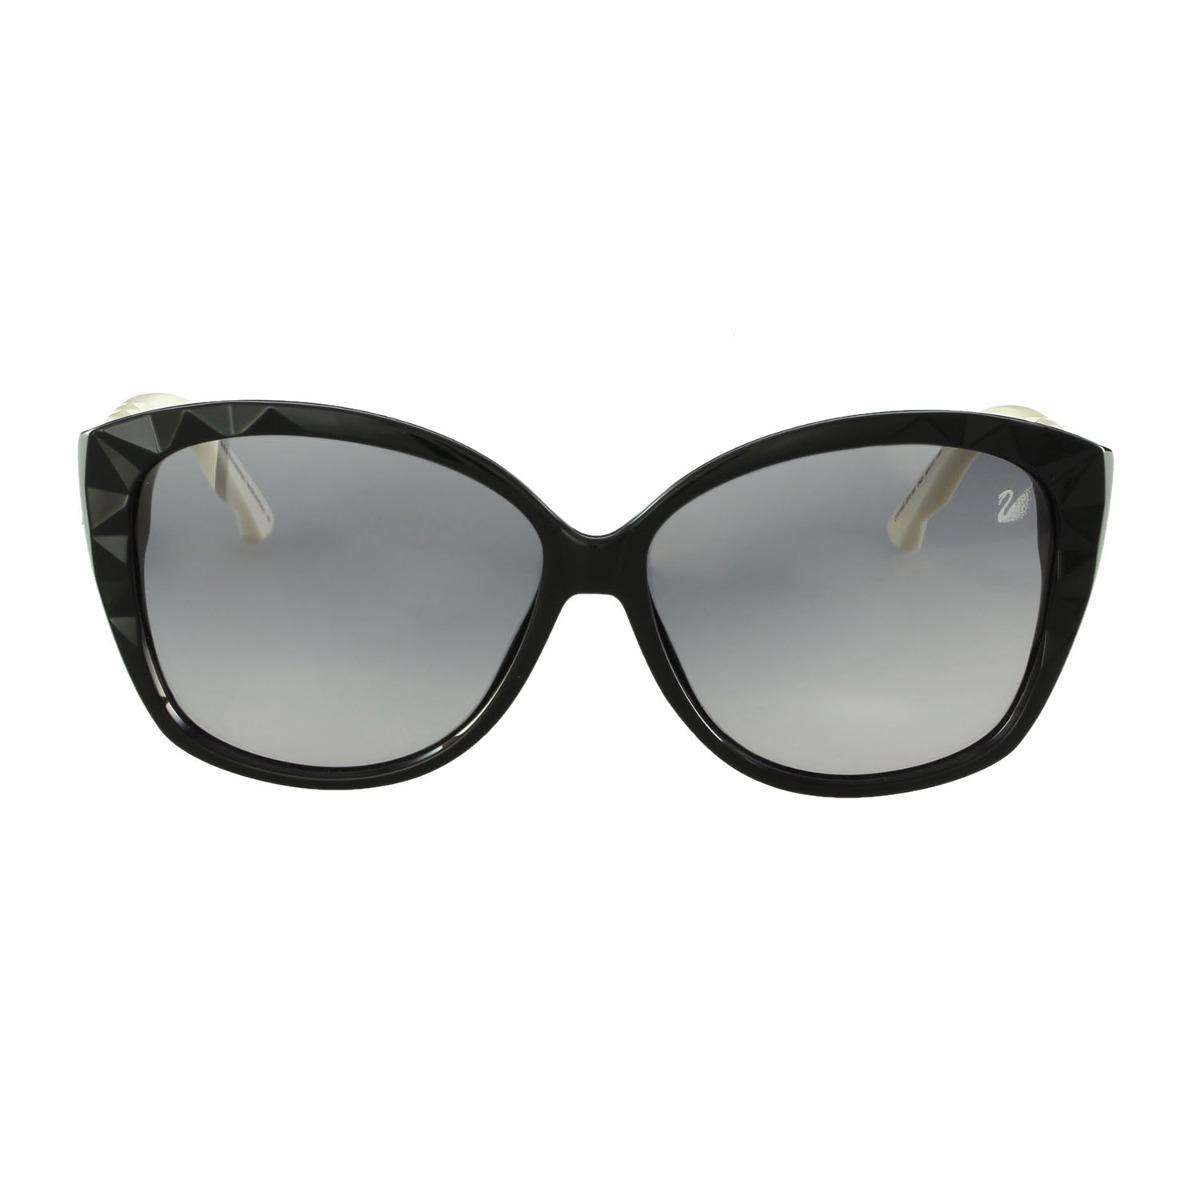 c4792463fb032 óculos de sol swarovski gatinho preto. Carregando zoom.